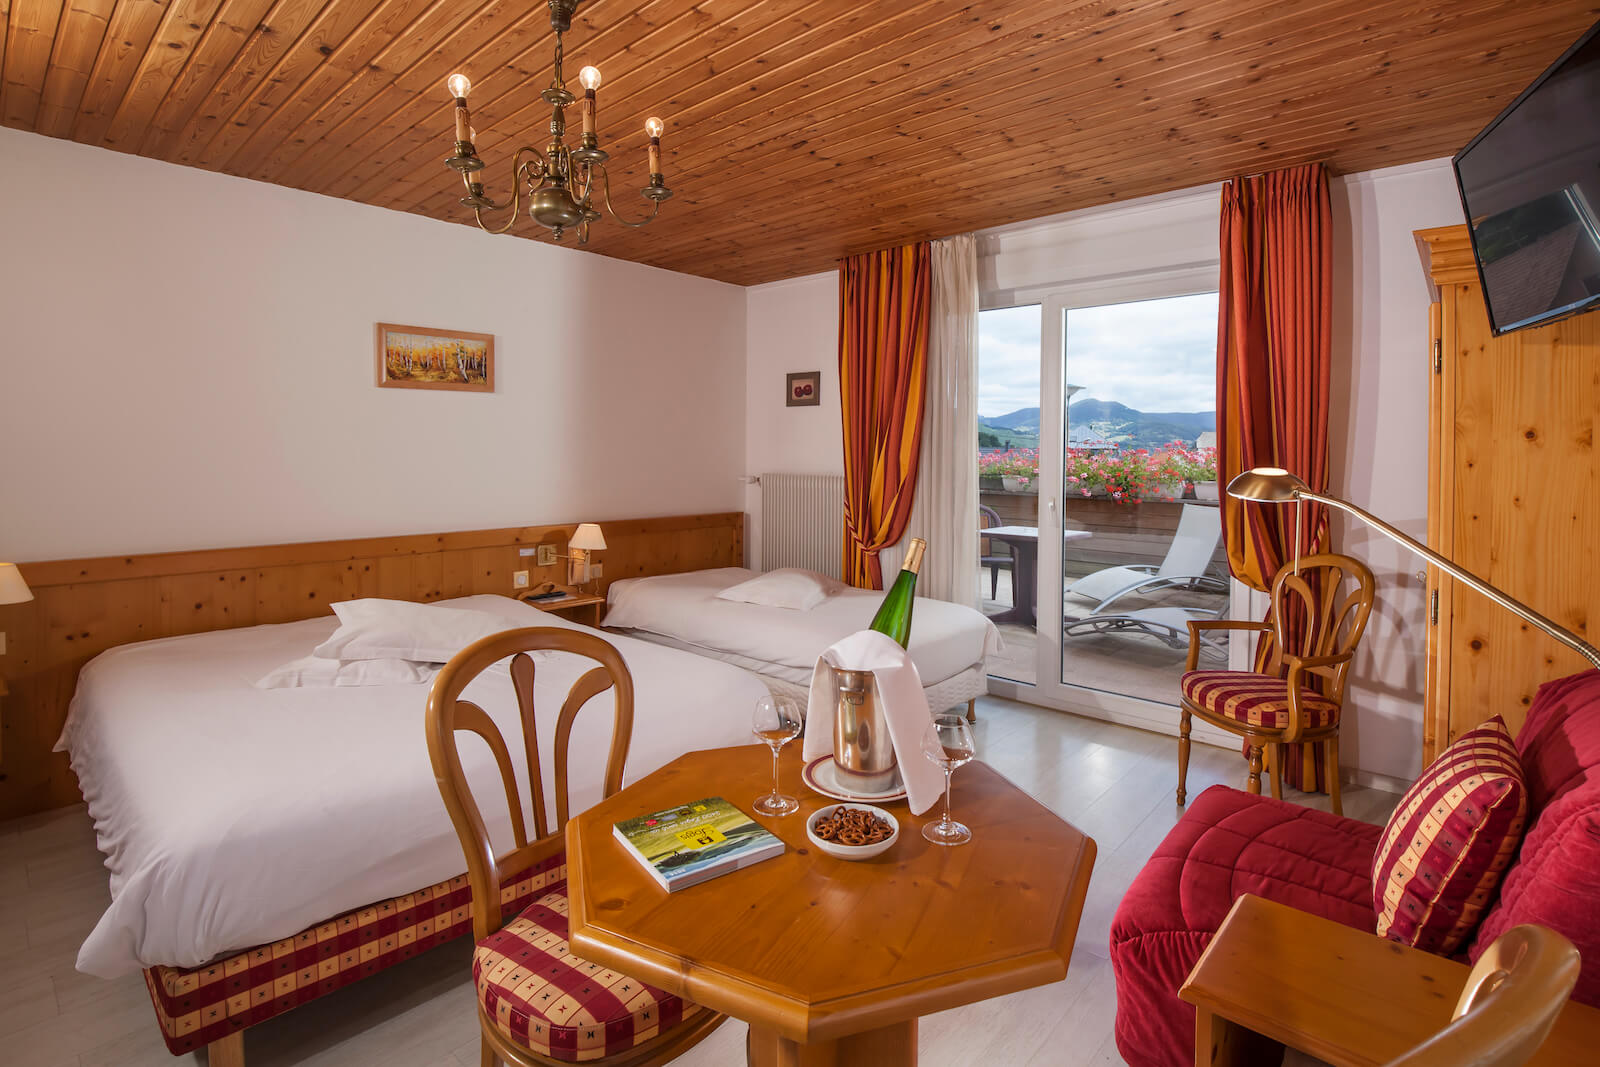 Hotel Restaurant Bois Le Sire Orbey